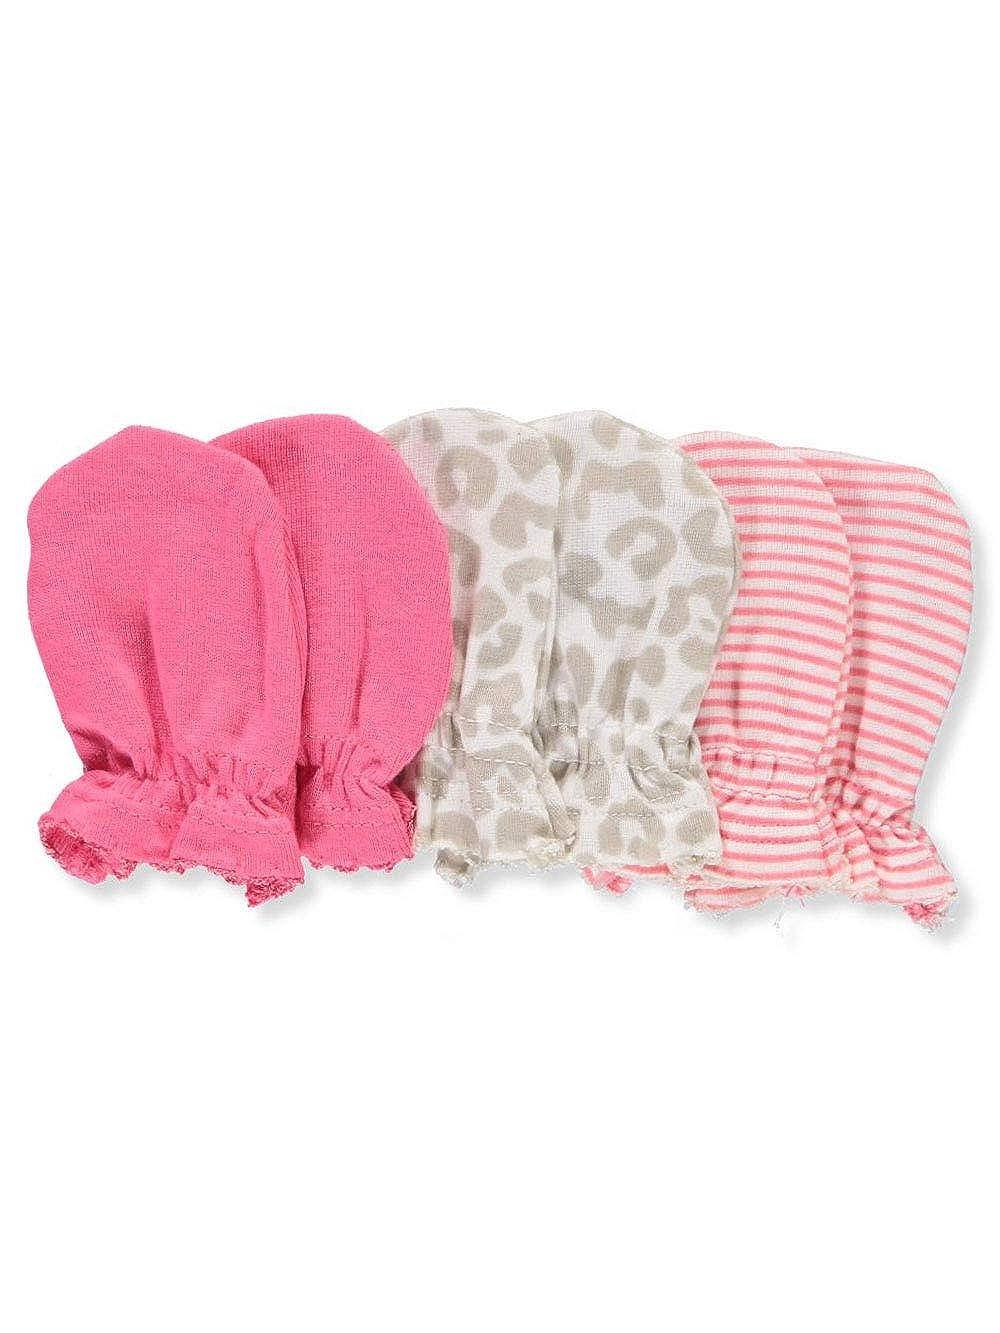 Amazon.com: Gerber Baby Girls paquete de 6 manoplas ...